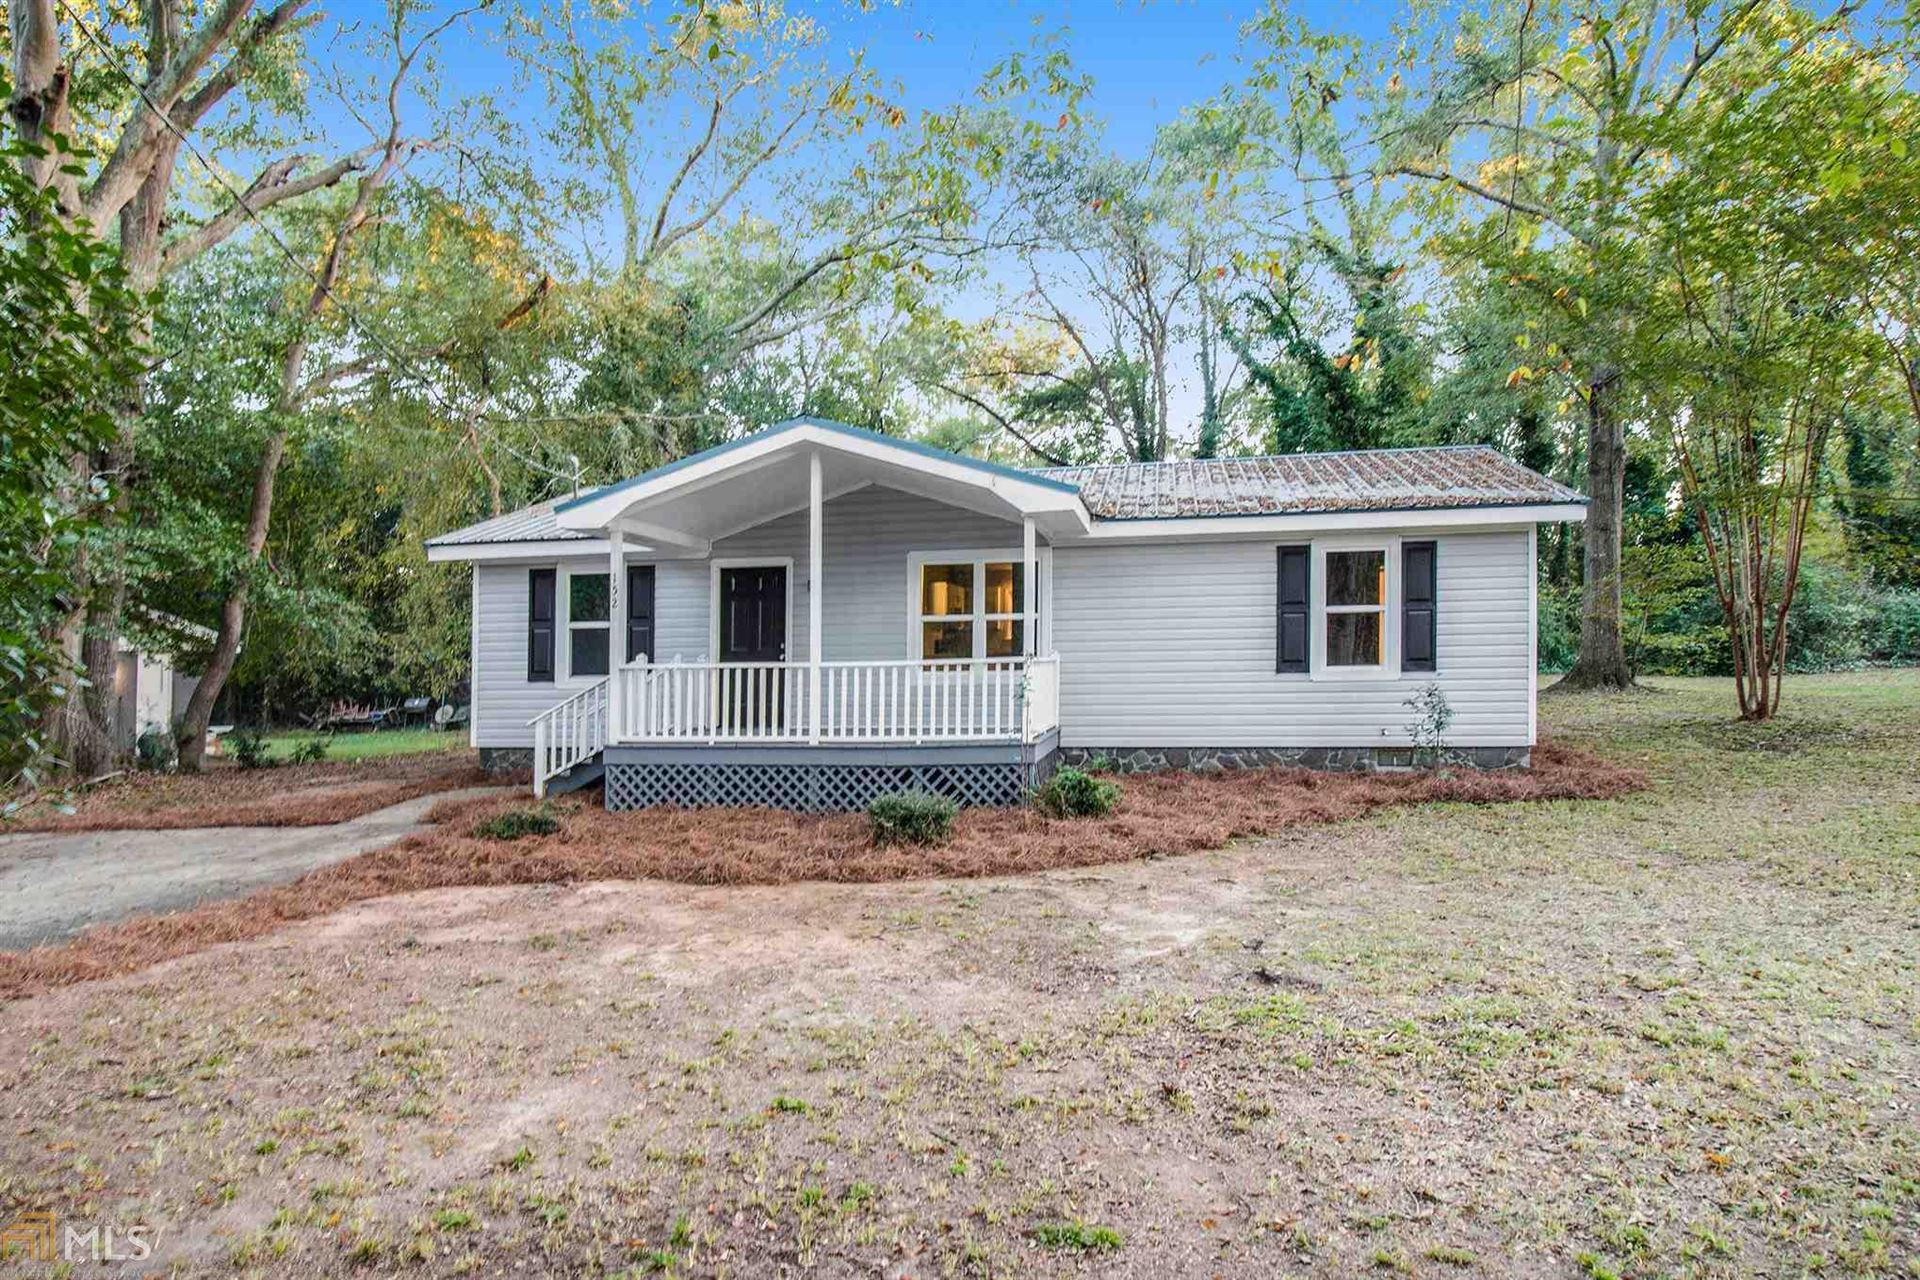 152 Mccord St, Jackson, GA 30233 - MLS#: 8878965